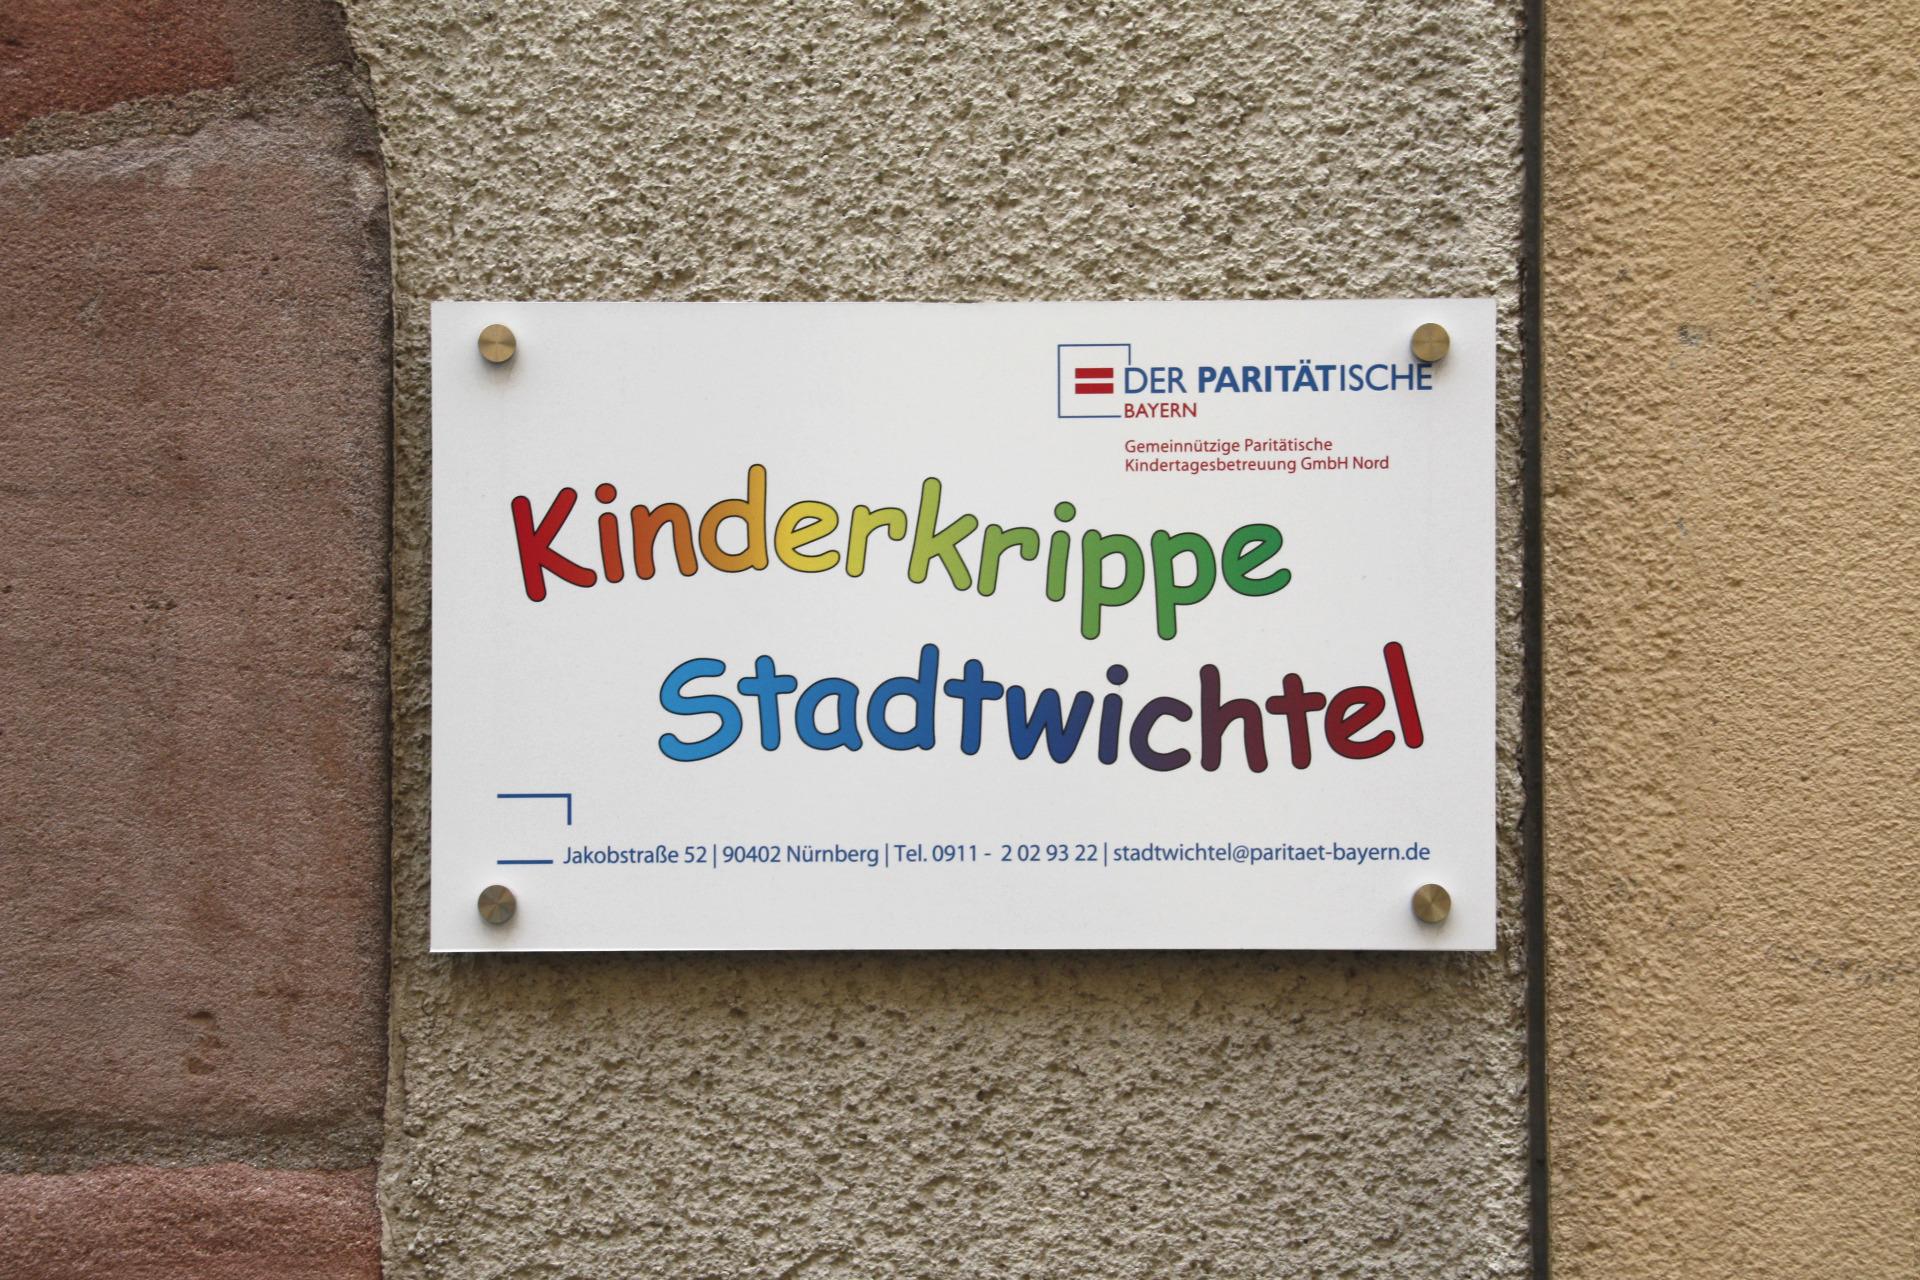 Paritatische Kinderkrippe Stadtwichtel 90402 Nurnberg